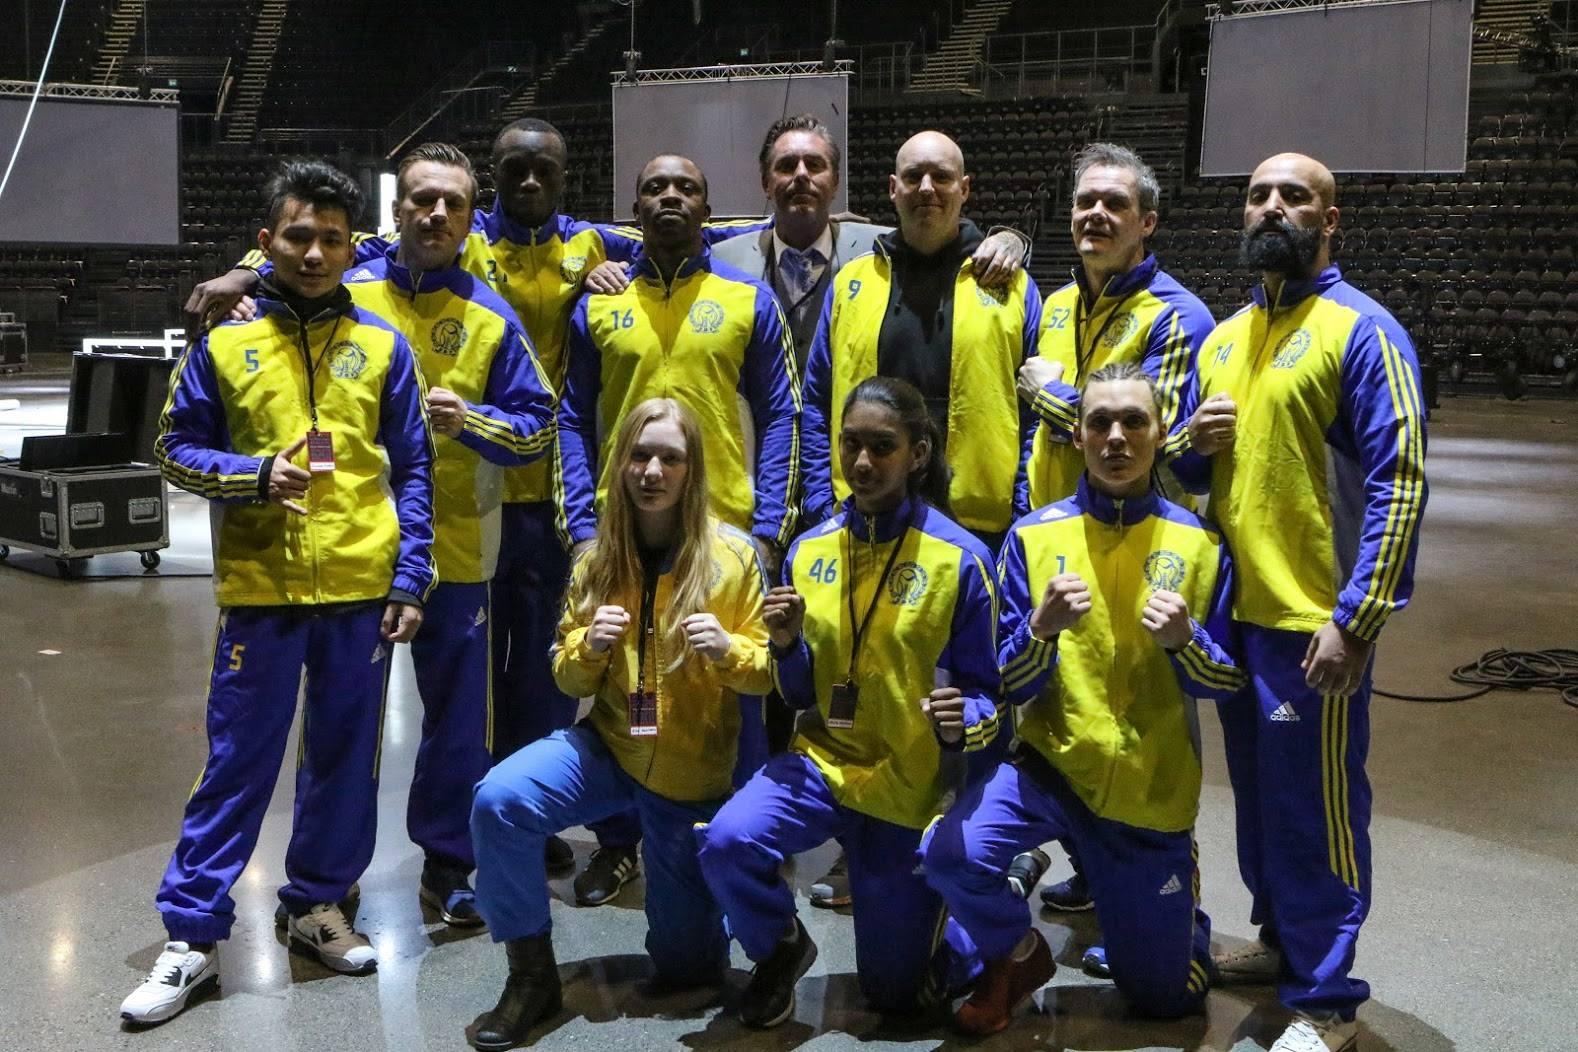 Team Sverige, The Nordic Rumble 2017